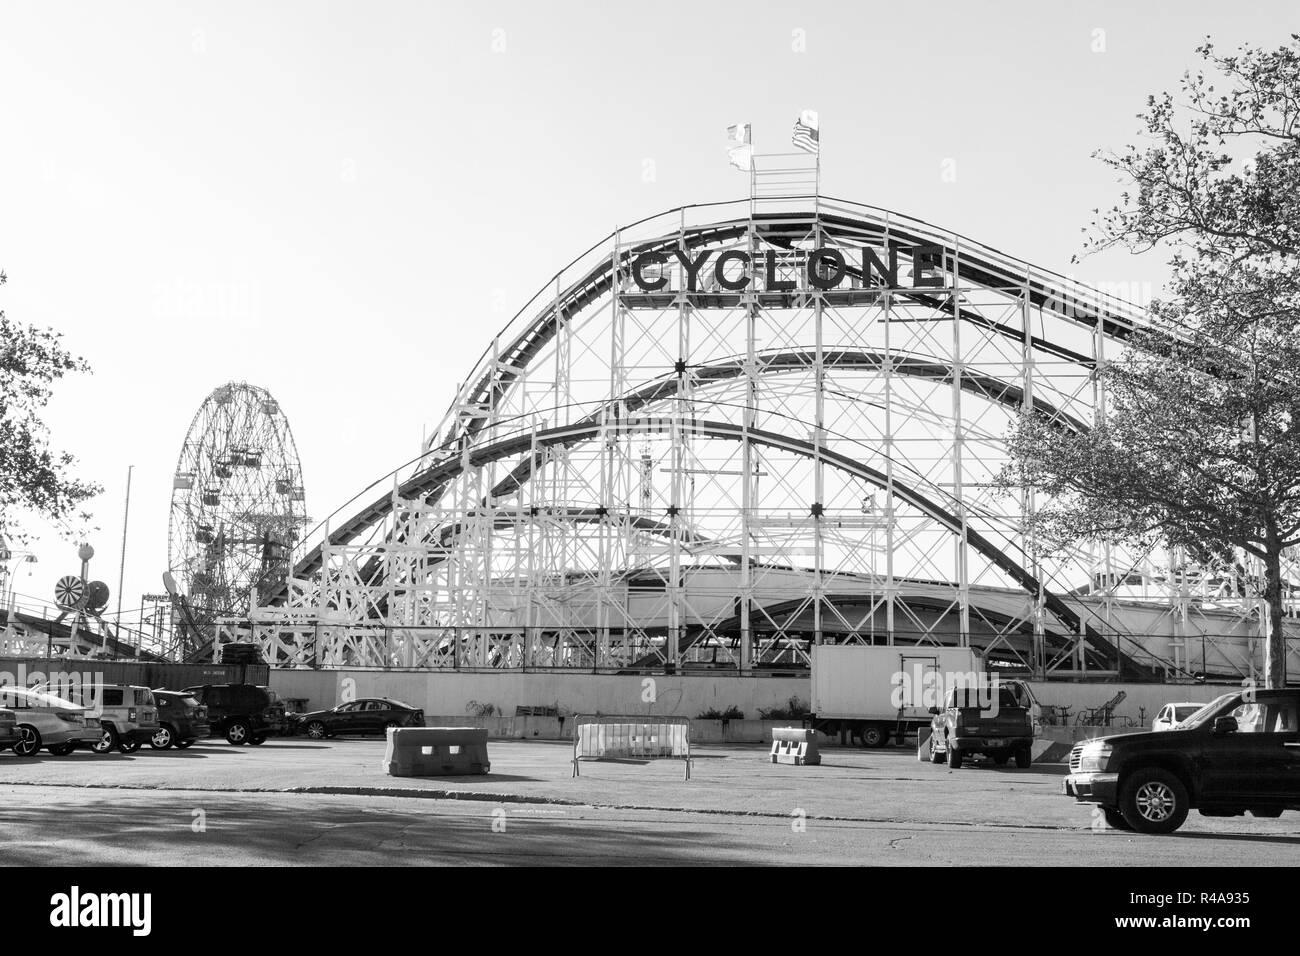 Cyclone Roller Coaster Coney Island Brooklyn New York City United States Of America Stock Photo Alamy